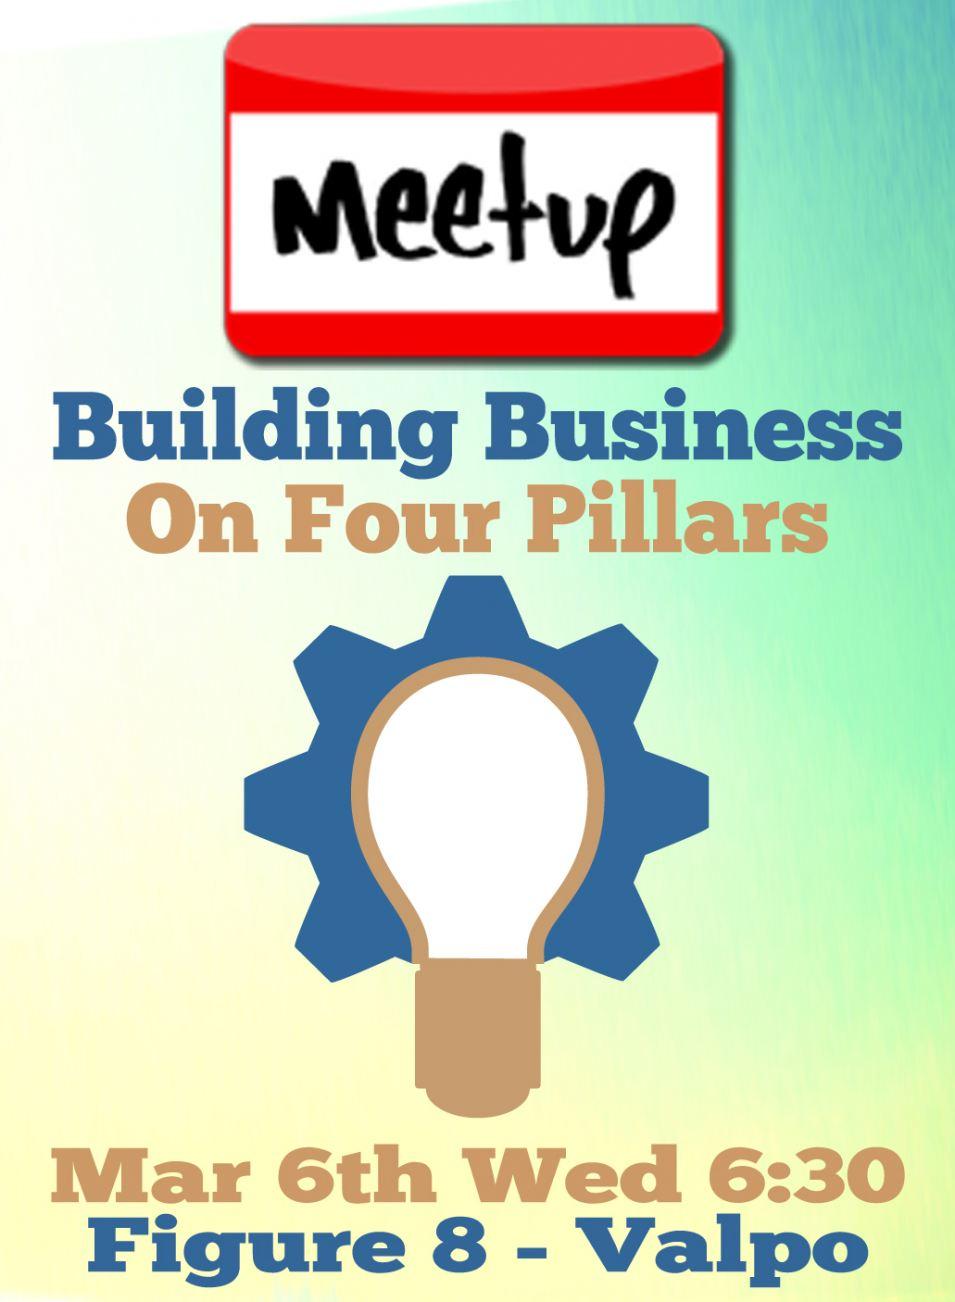 Building Business on 4 Pillars - Duneland Innovators